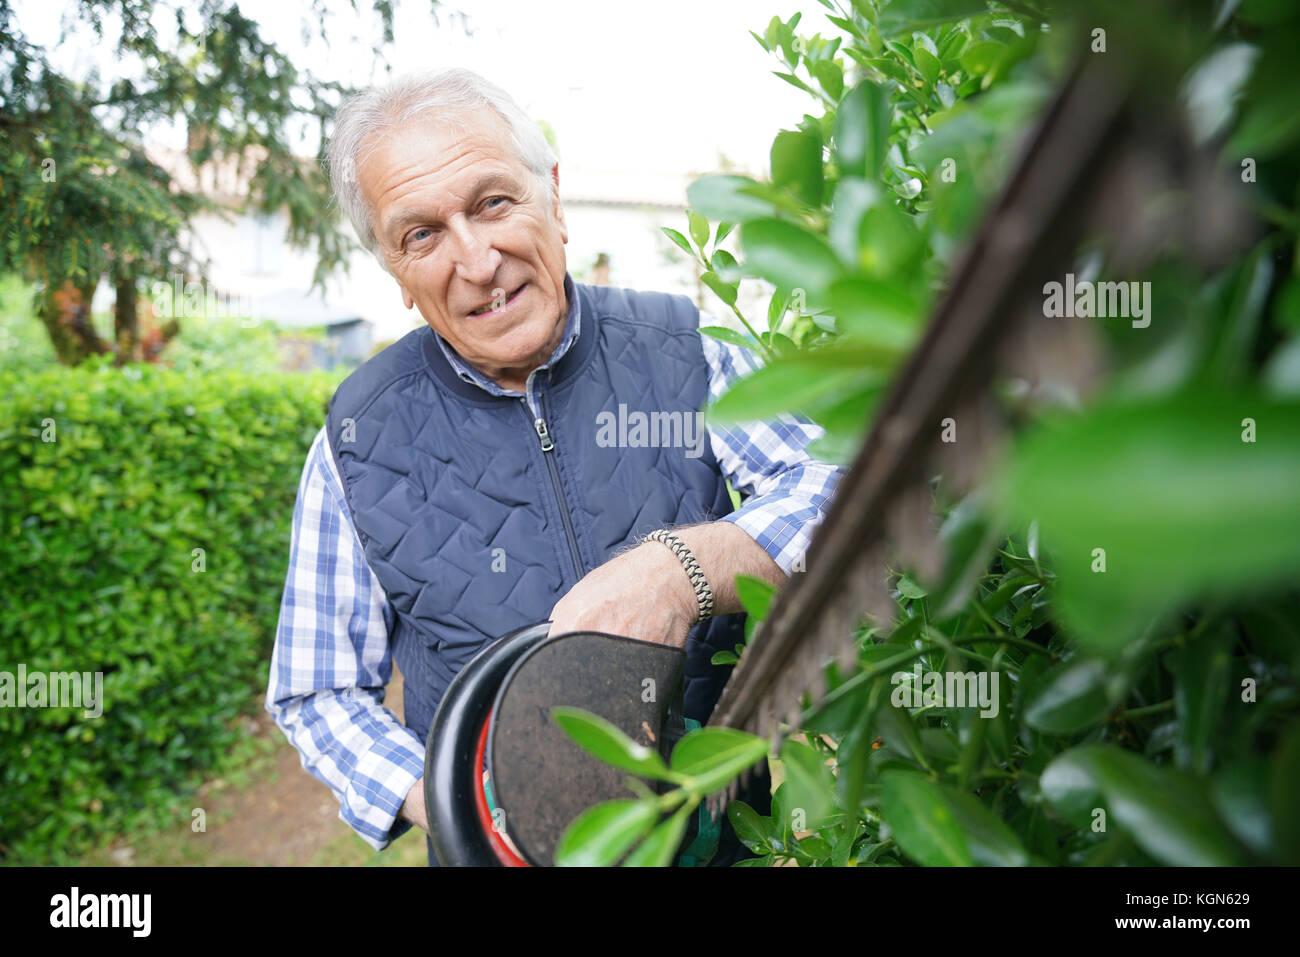 Senior uomo con tagliasiepi Immagini Stock